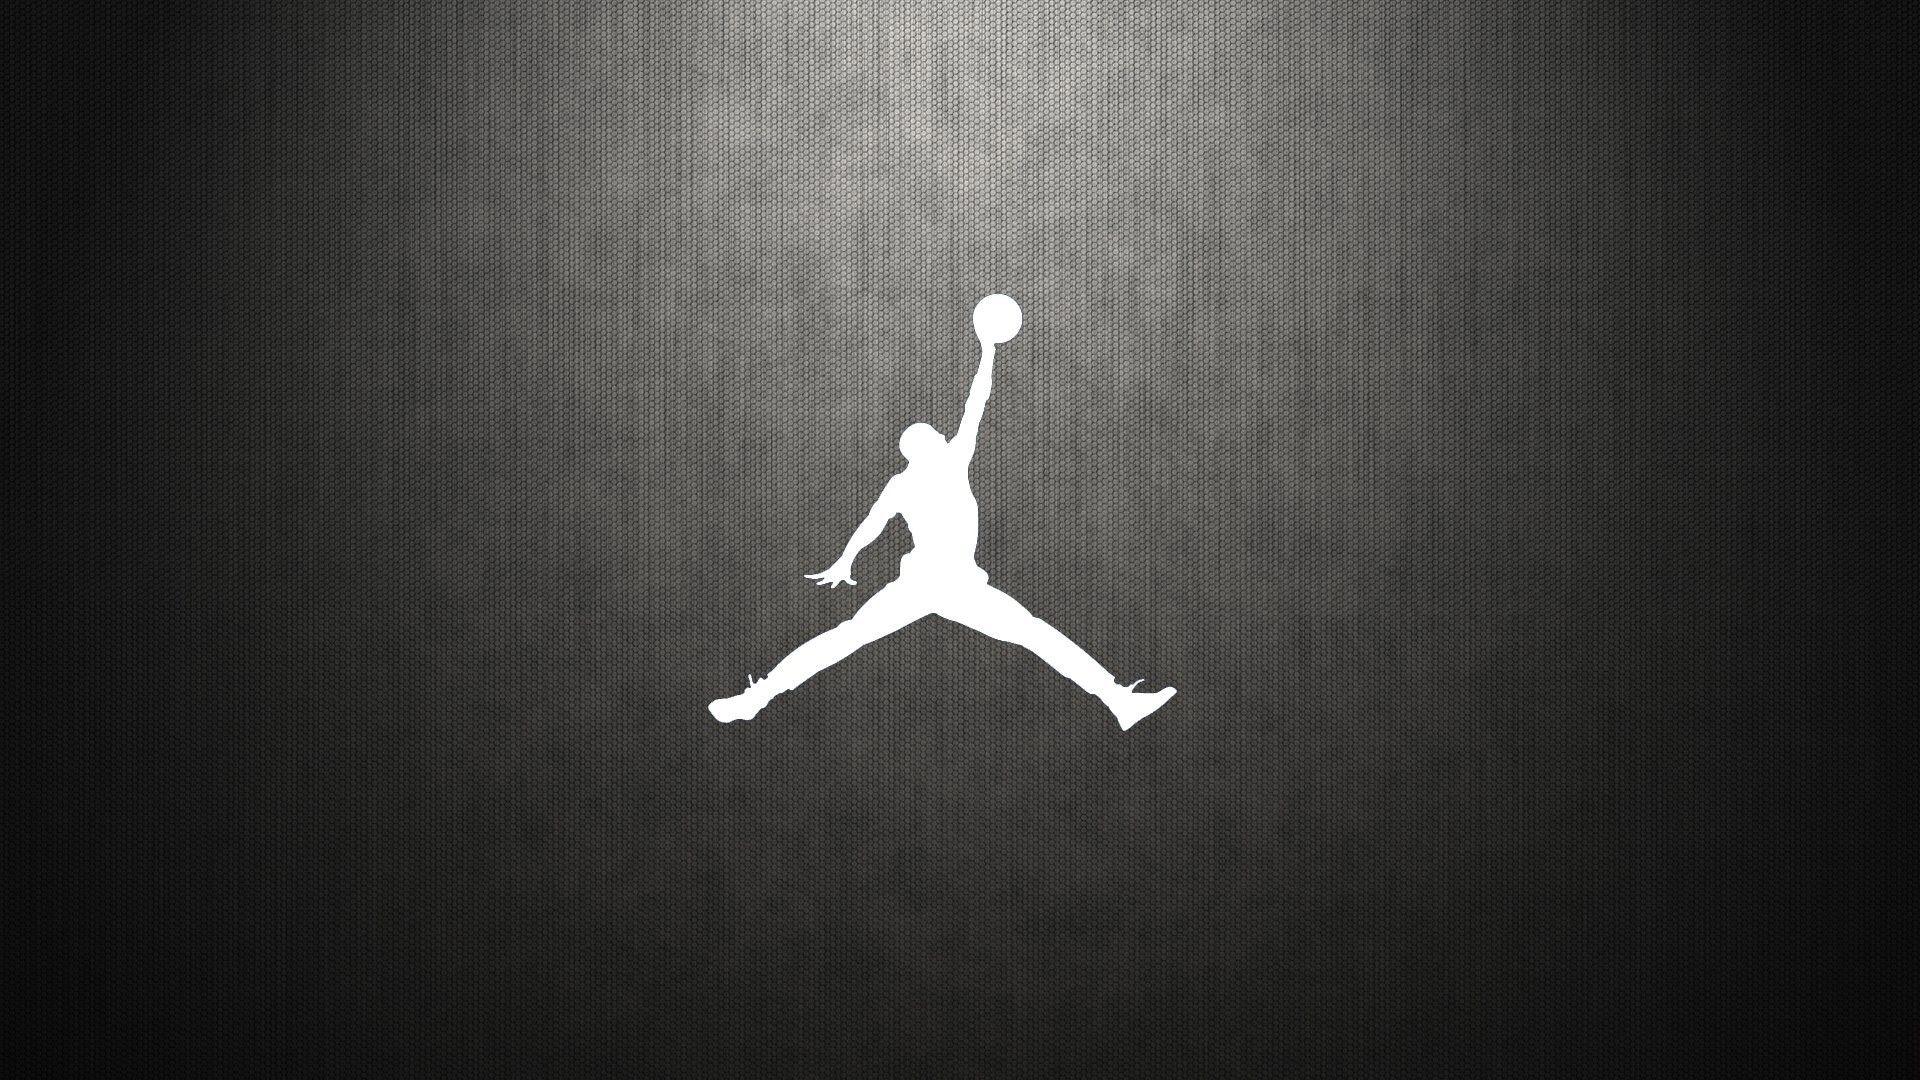 1920x1080 Jordan Logos Wallpaper 1920x1080 Jordan Logos Kicks Jumpman23 Jordan Logo Wallpaper Logo Wallpaper Hd Basketball Wallpaper